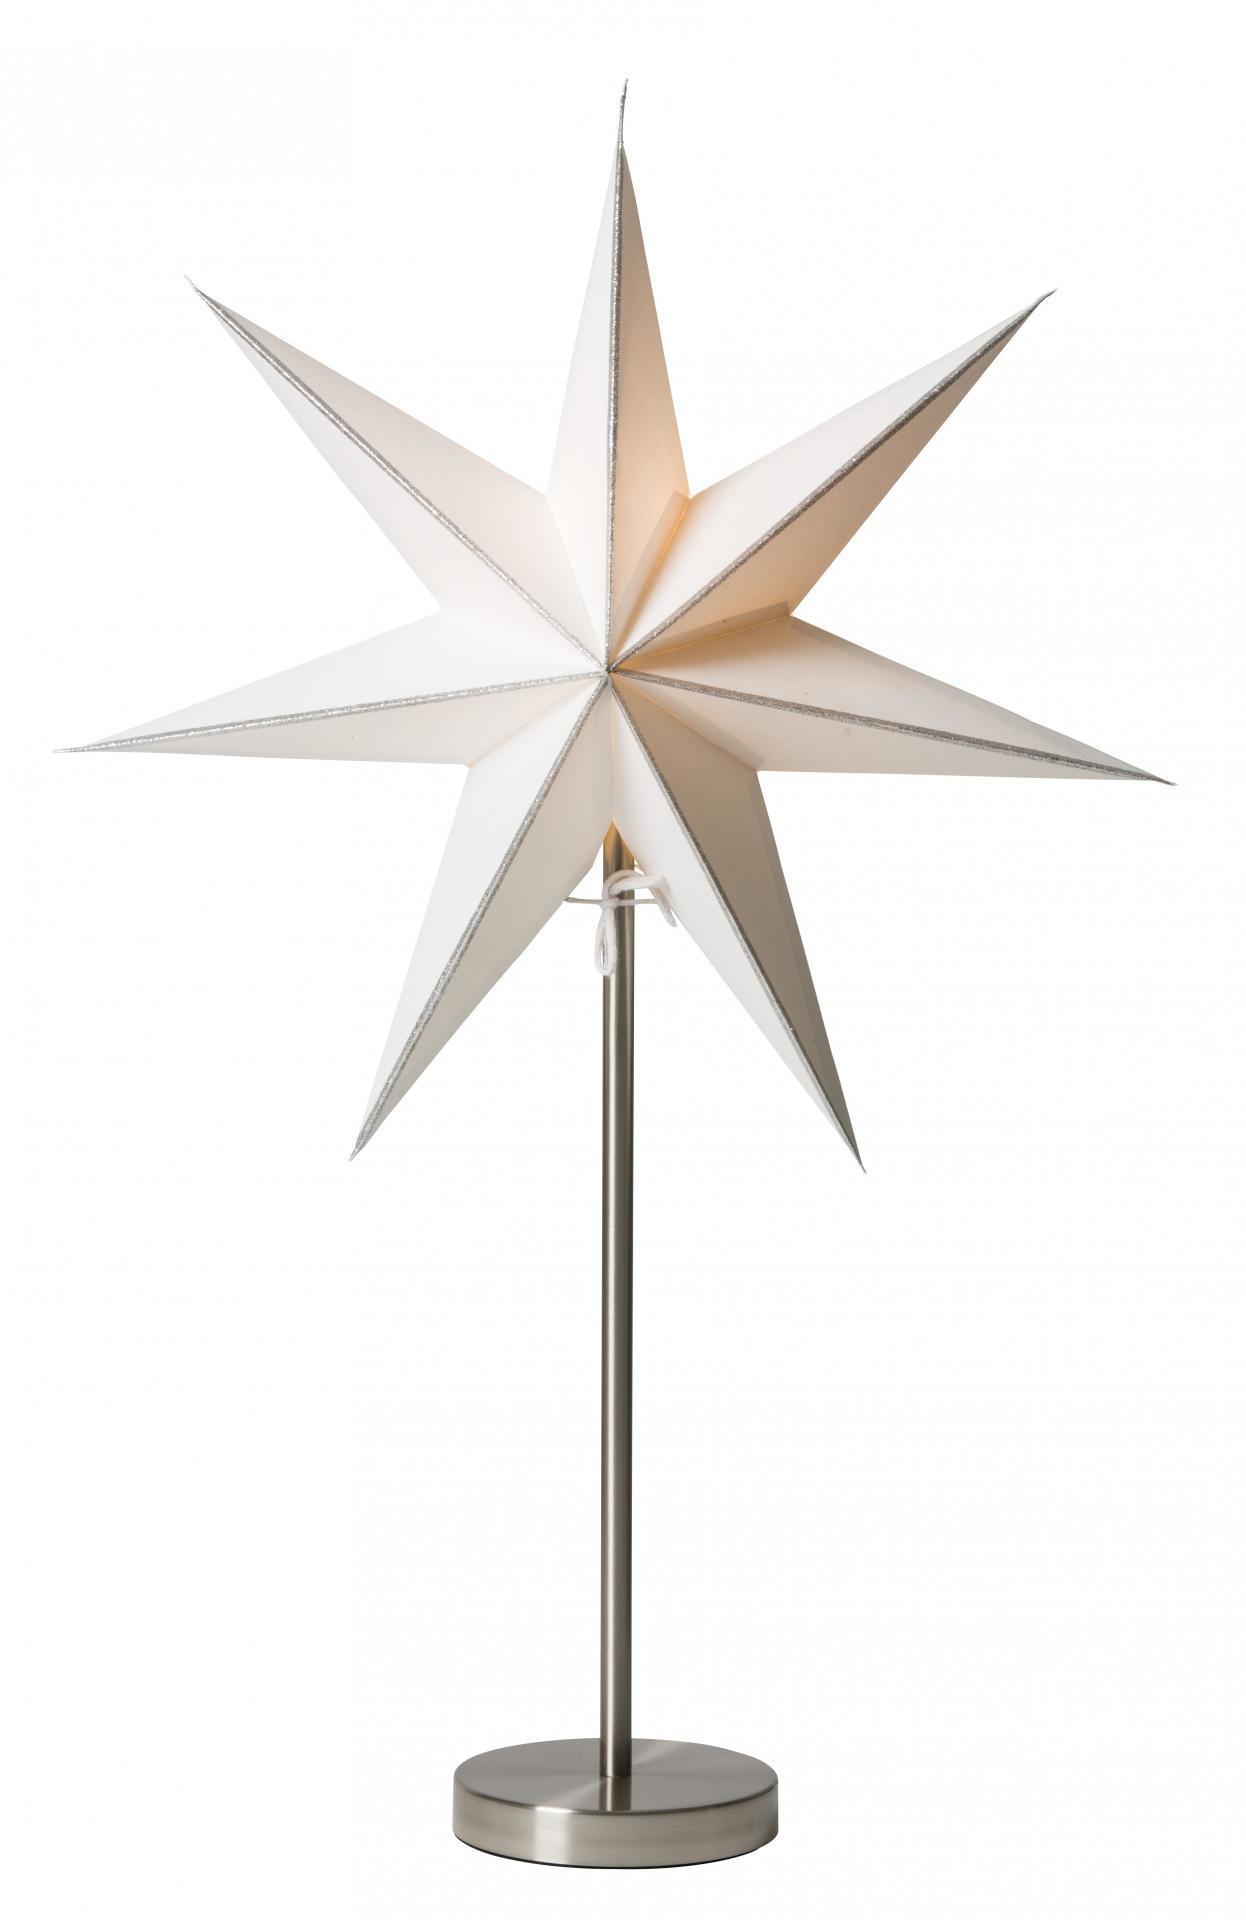 watt & VEKE Stolní lampa Linje Silver/Kalix chrome, bílá barva, stříbrná barva, kov, papír